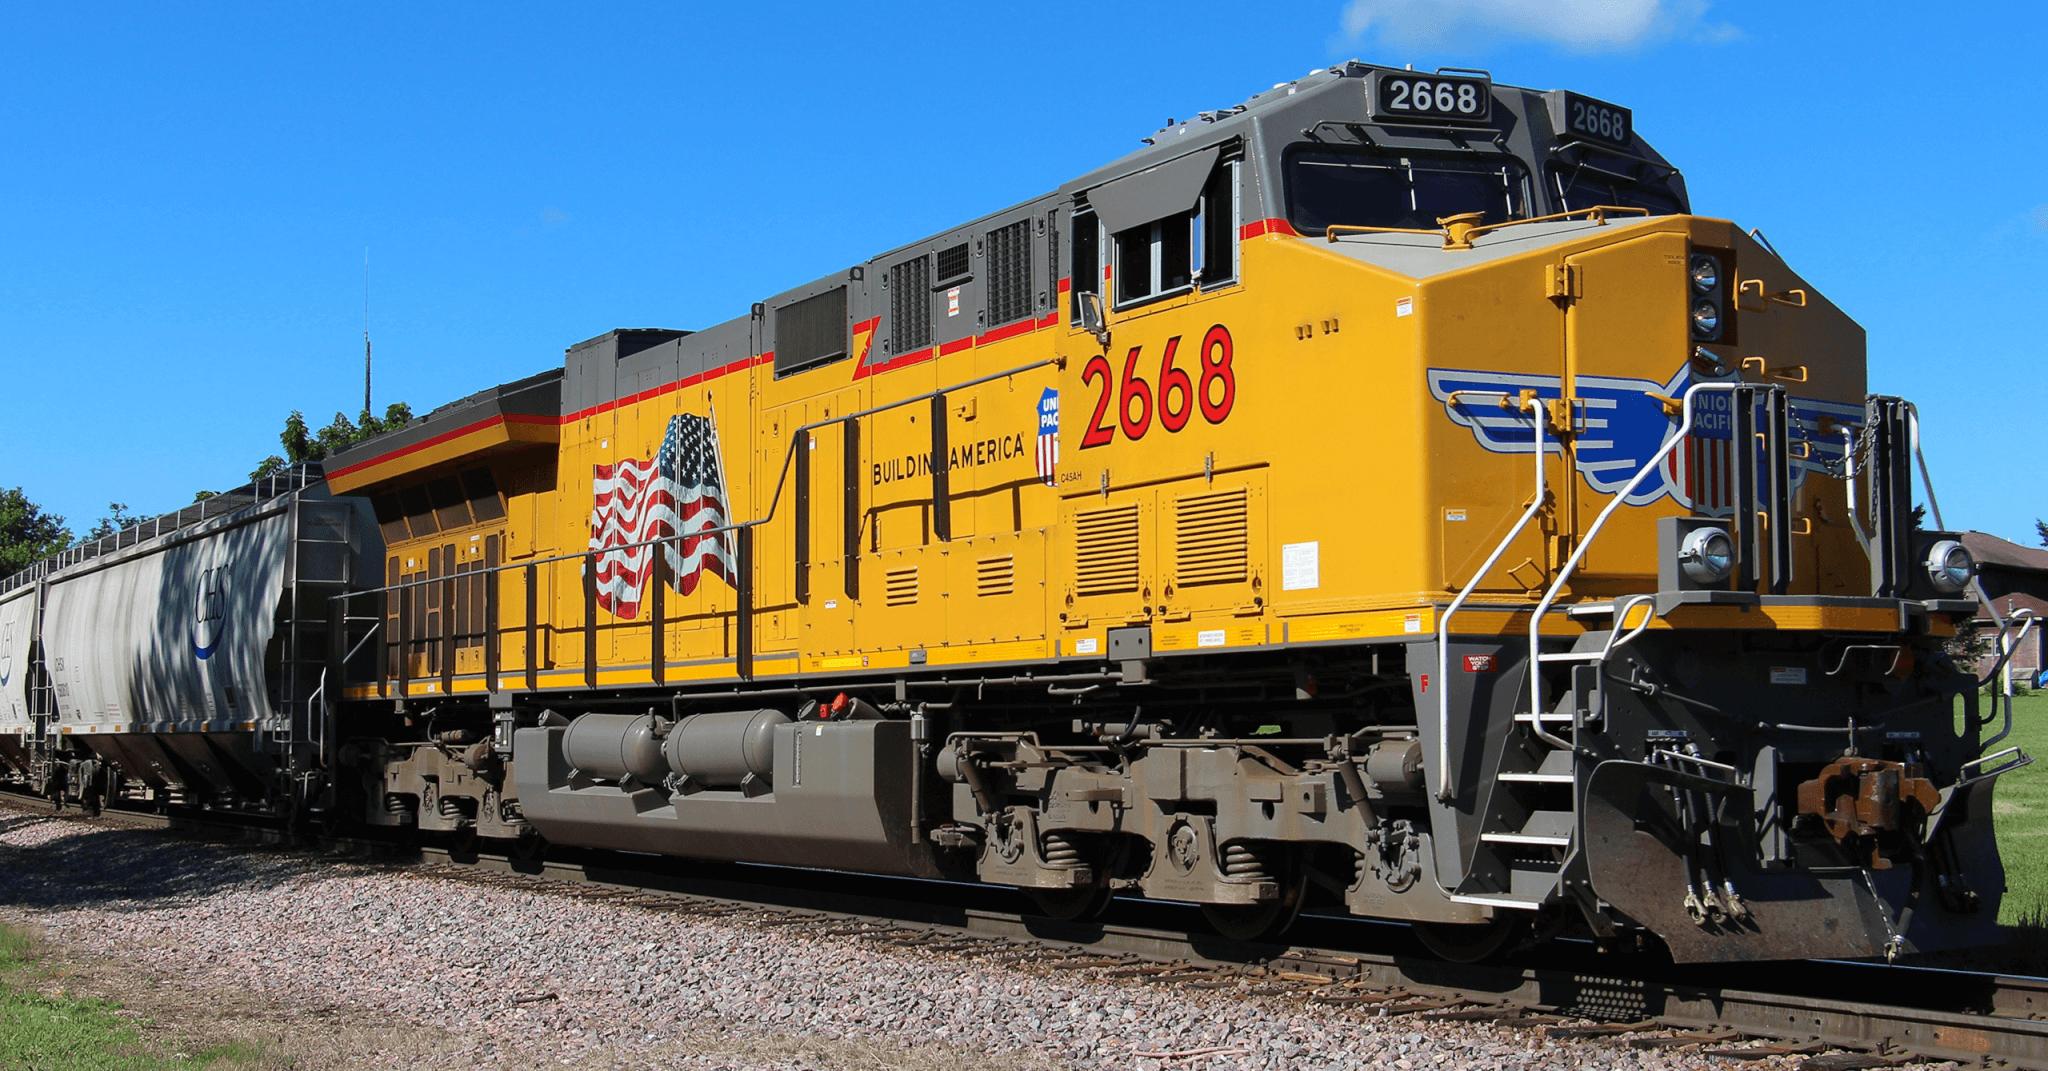 Lego Headquarters Railway News Union Pacific Is Safest U S Railroad For